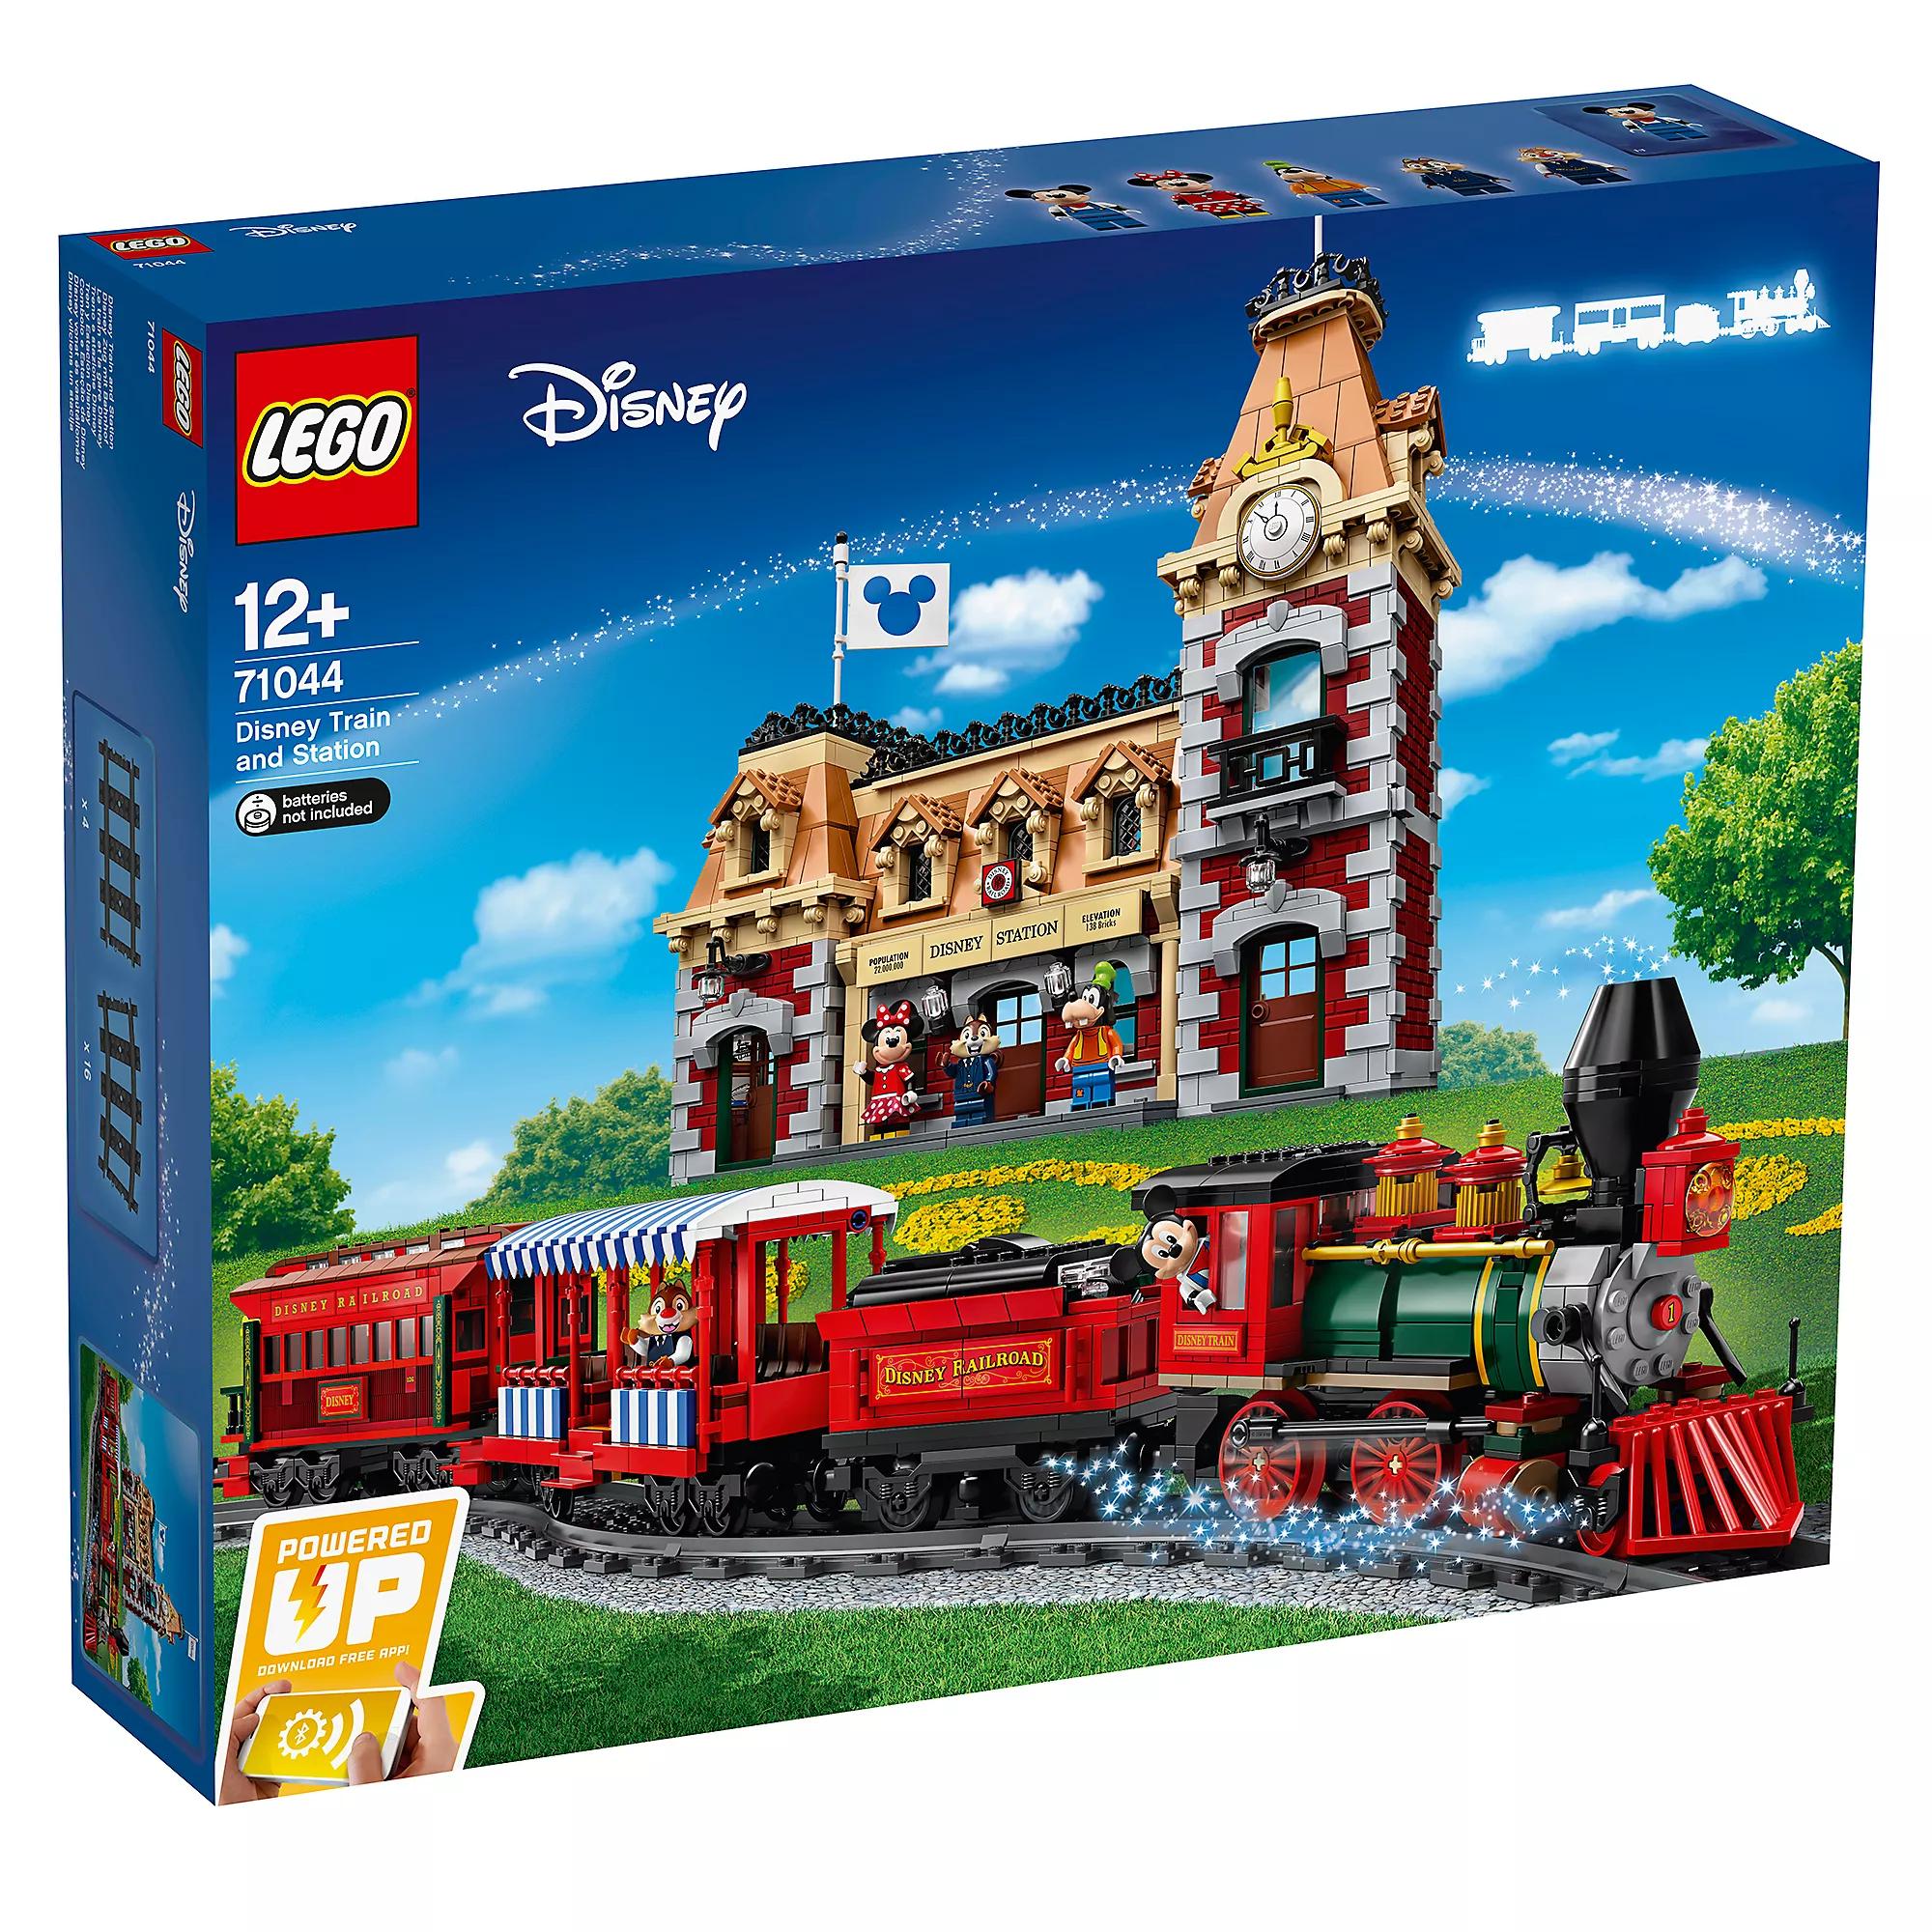 LEGO Disney Train and Station Set 71044 & LEGO Walt Disney World Castle Set 71040 £239.99 each at shopDisney